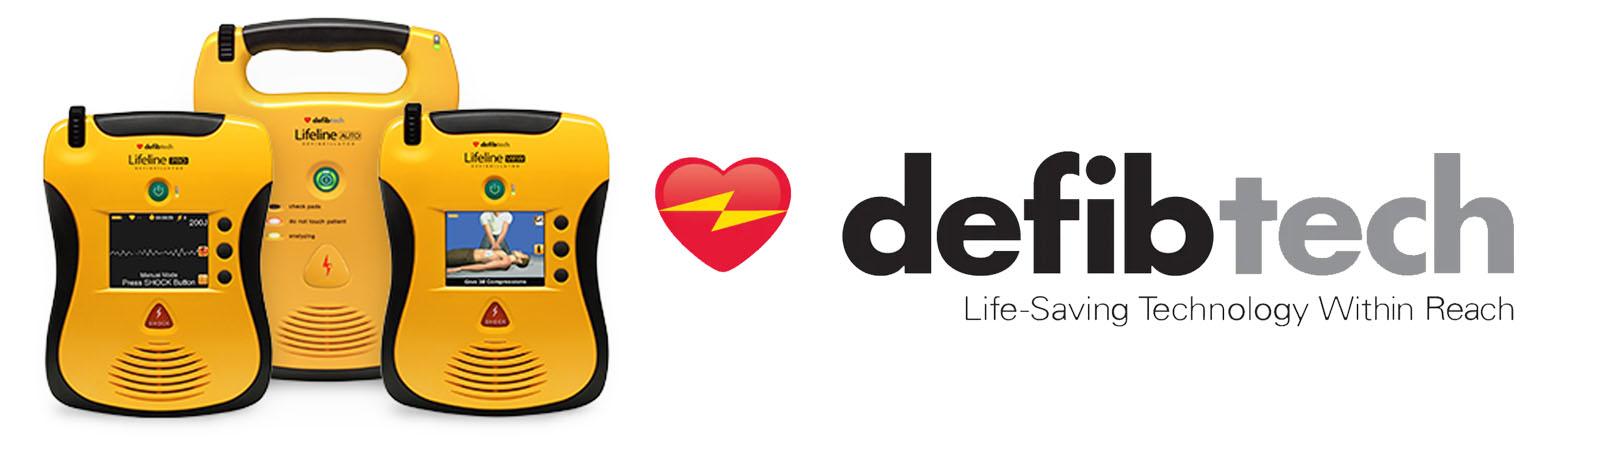 Defib Tech